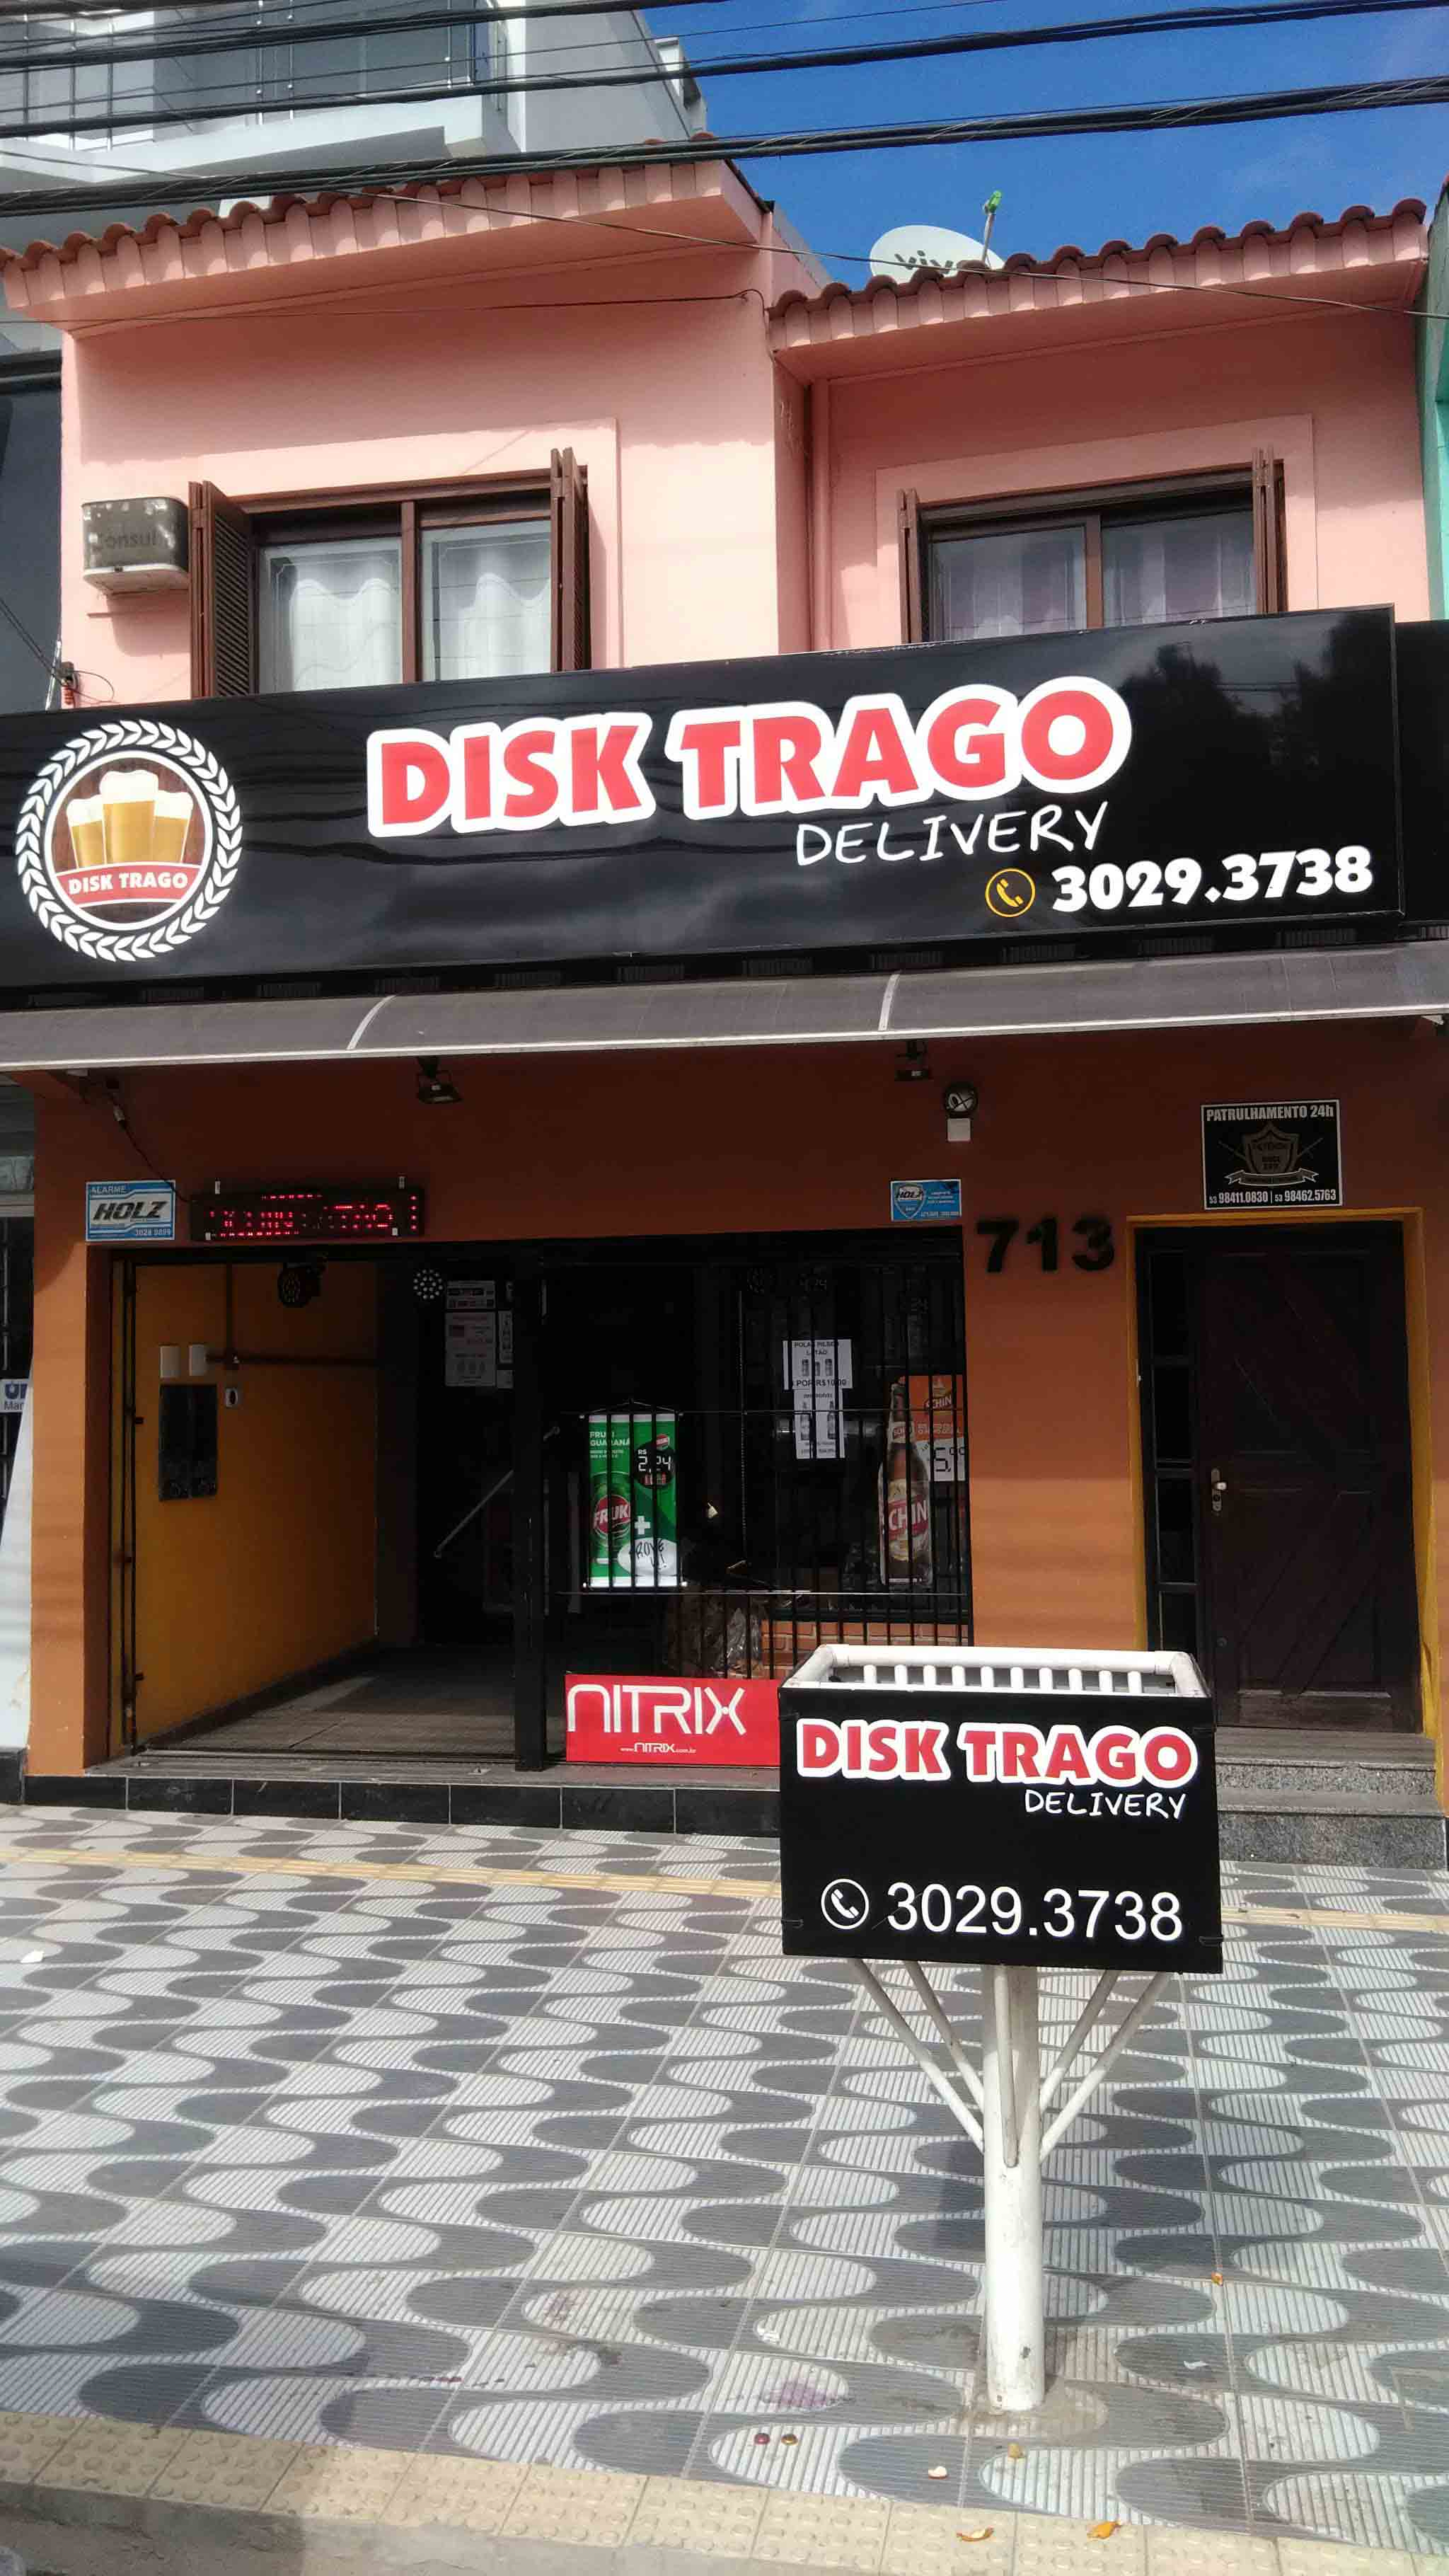 Disk Trago Delivery